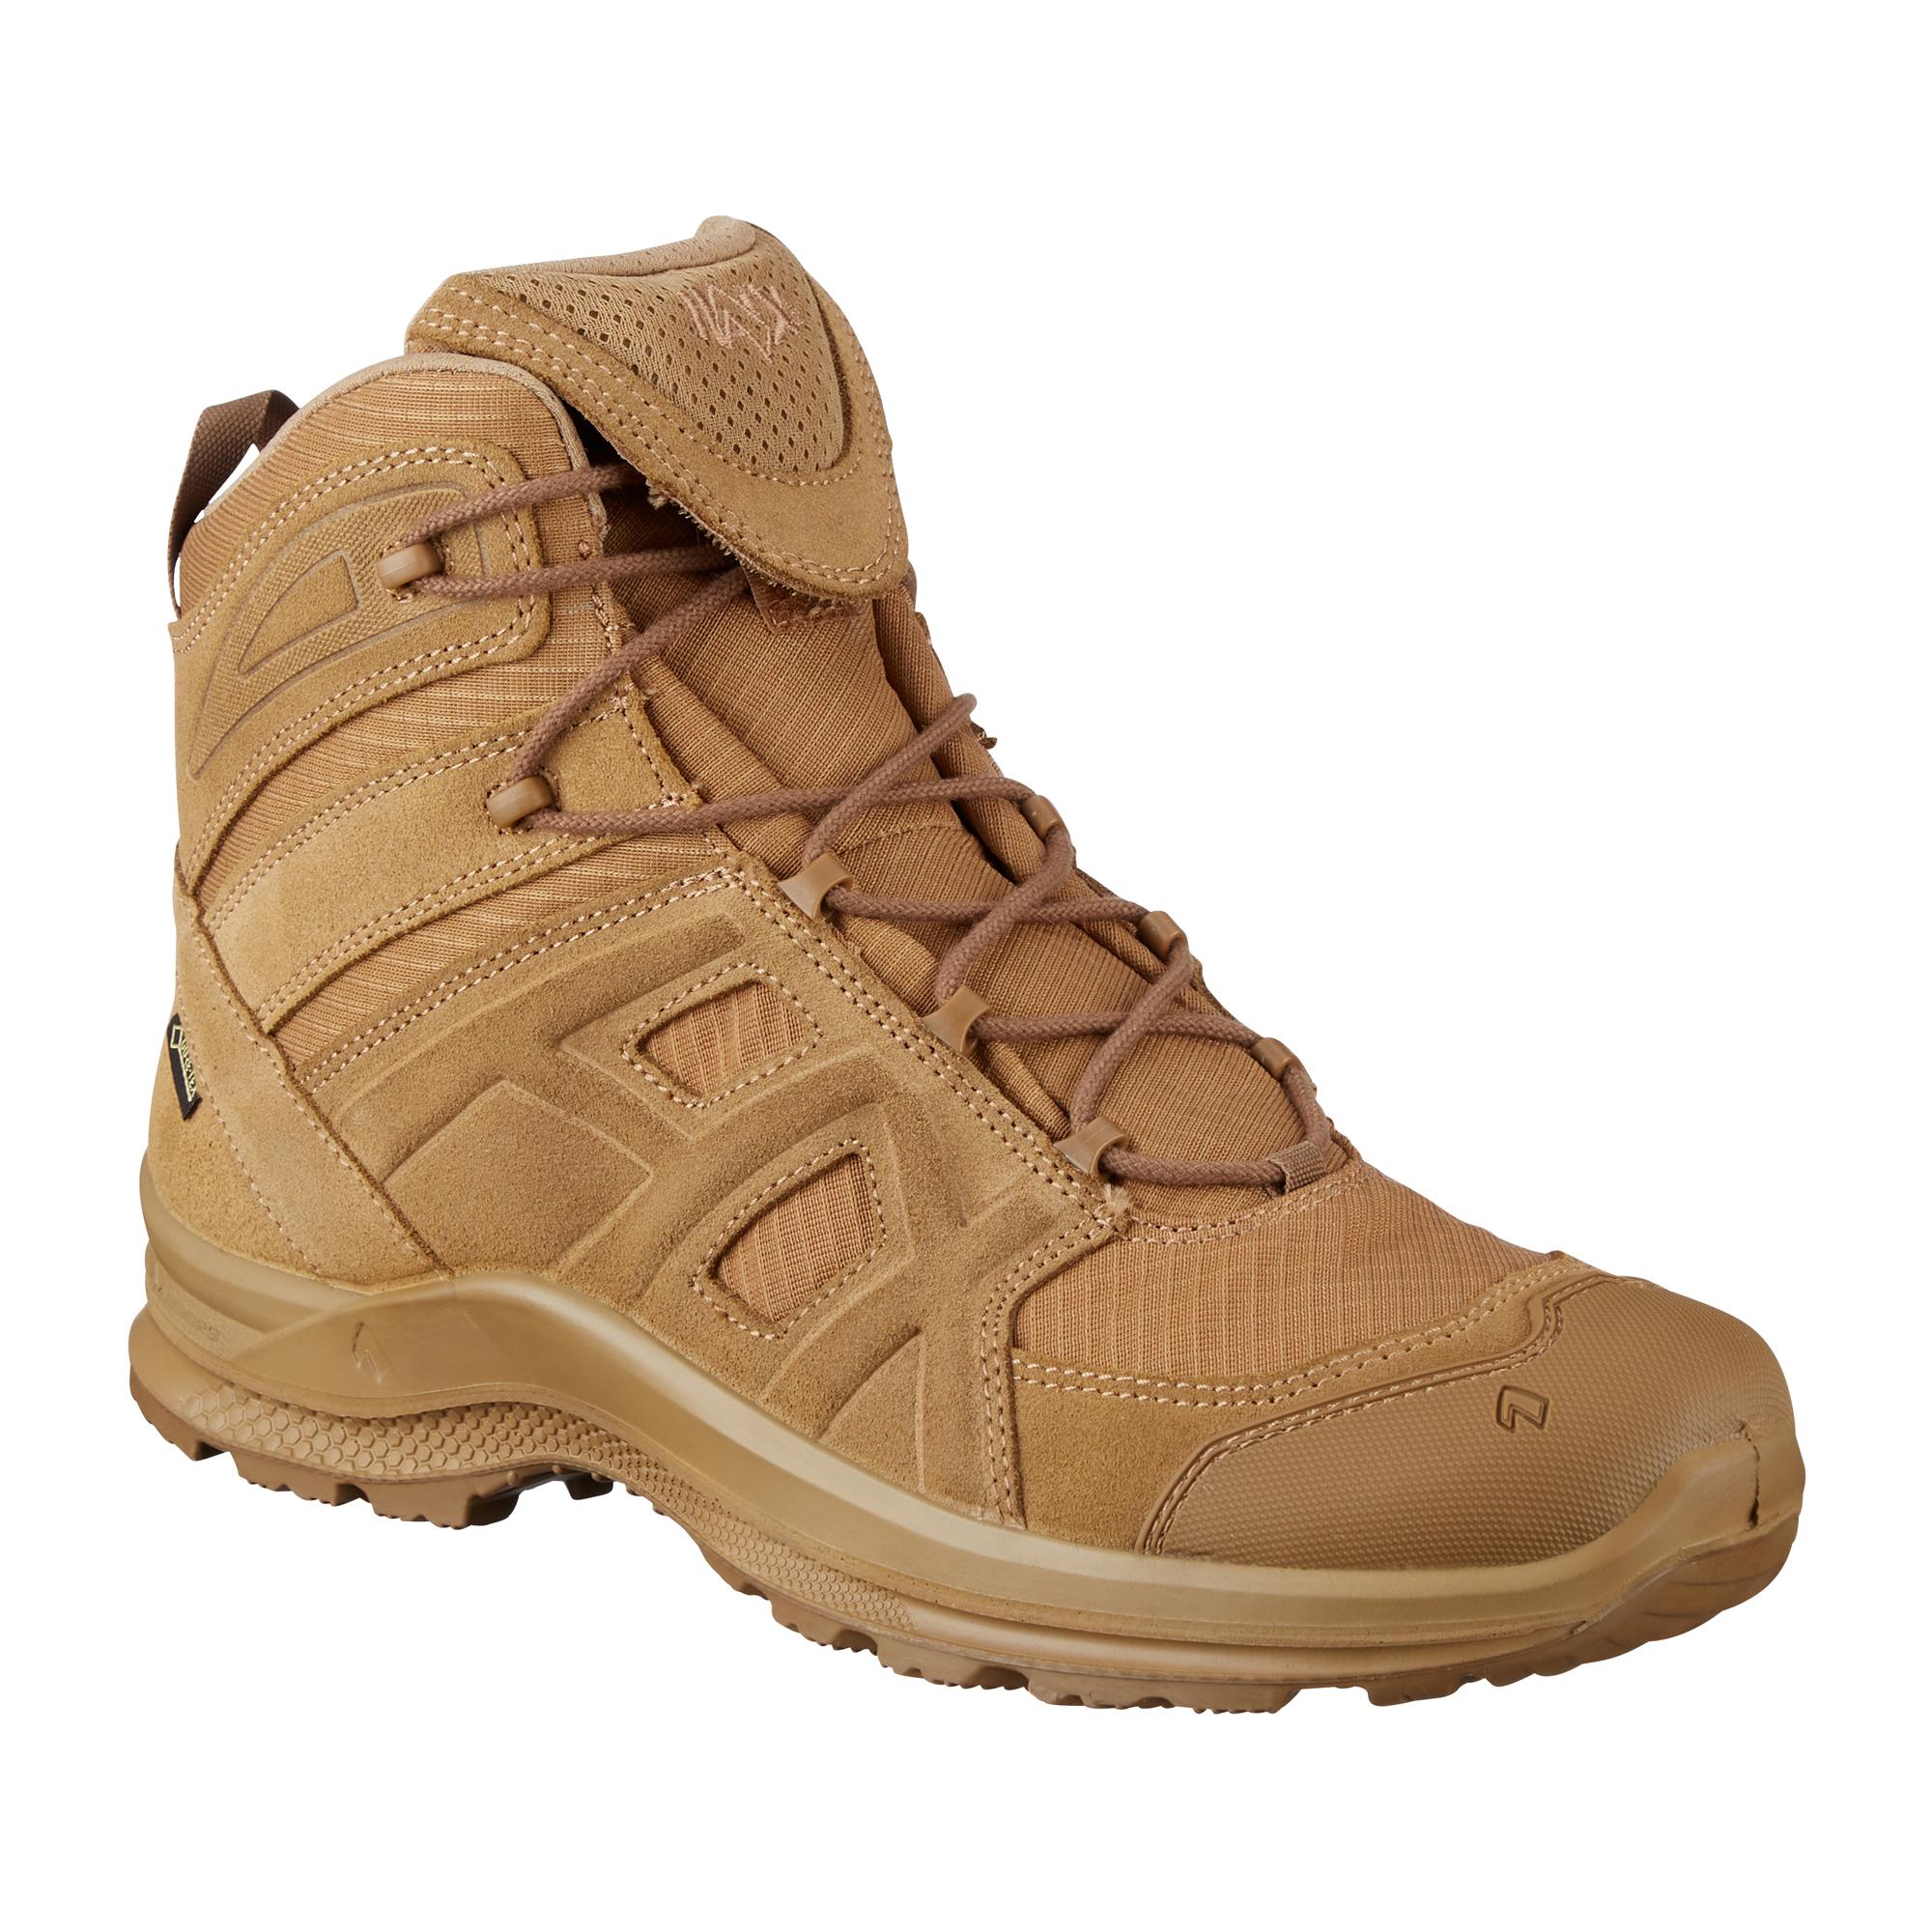 Haix Black Eagle Athletic Shoe 2.0 N GTX coyote